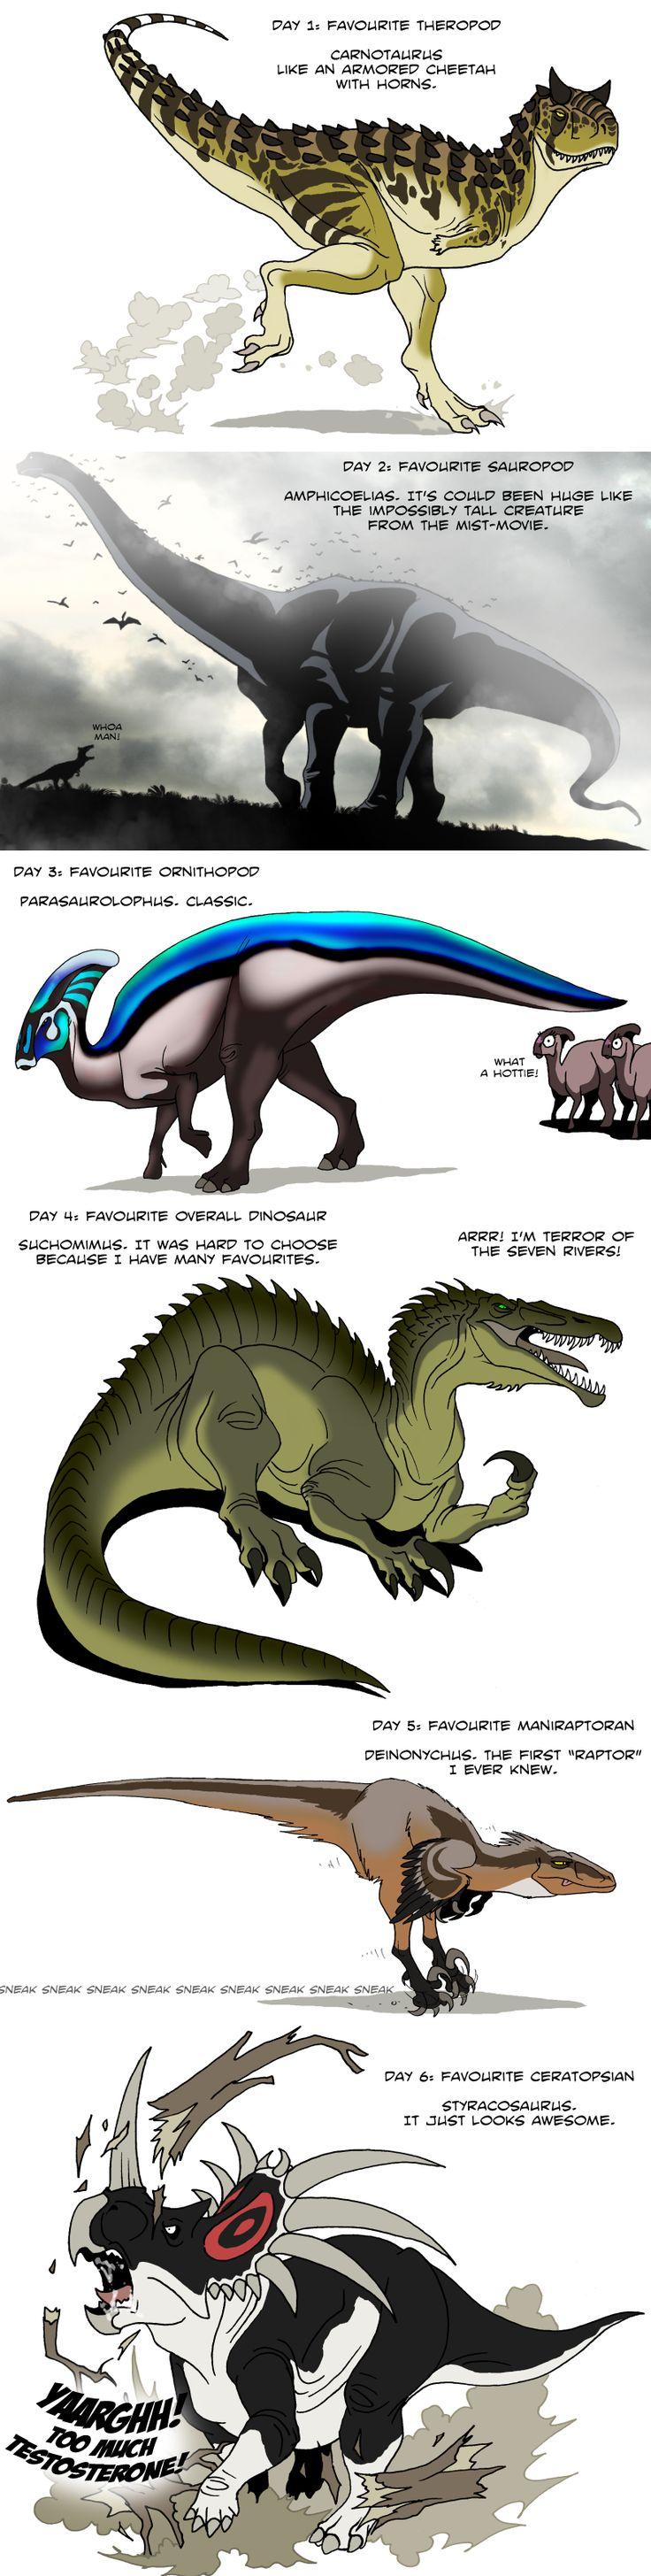 Jurassic park card 3 by chicagocubsfan24 on deviantart - Dinosaur Challenge 1 By Isismasshiro Deviantart Com On Deviantart